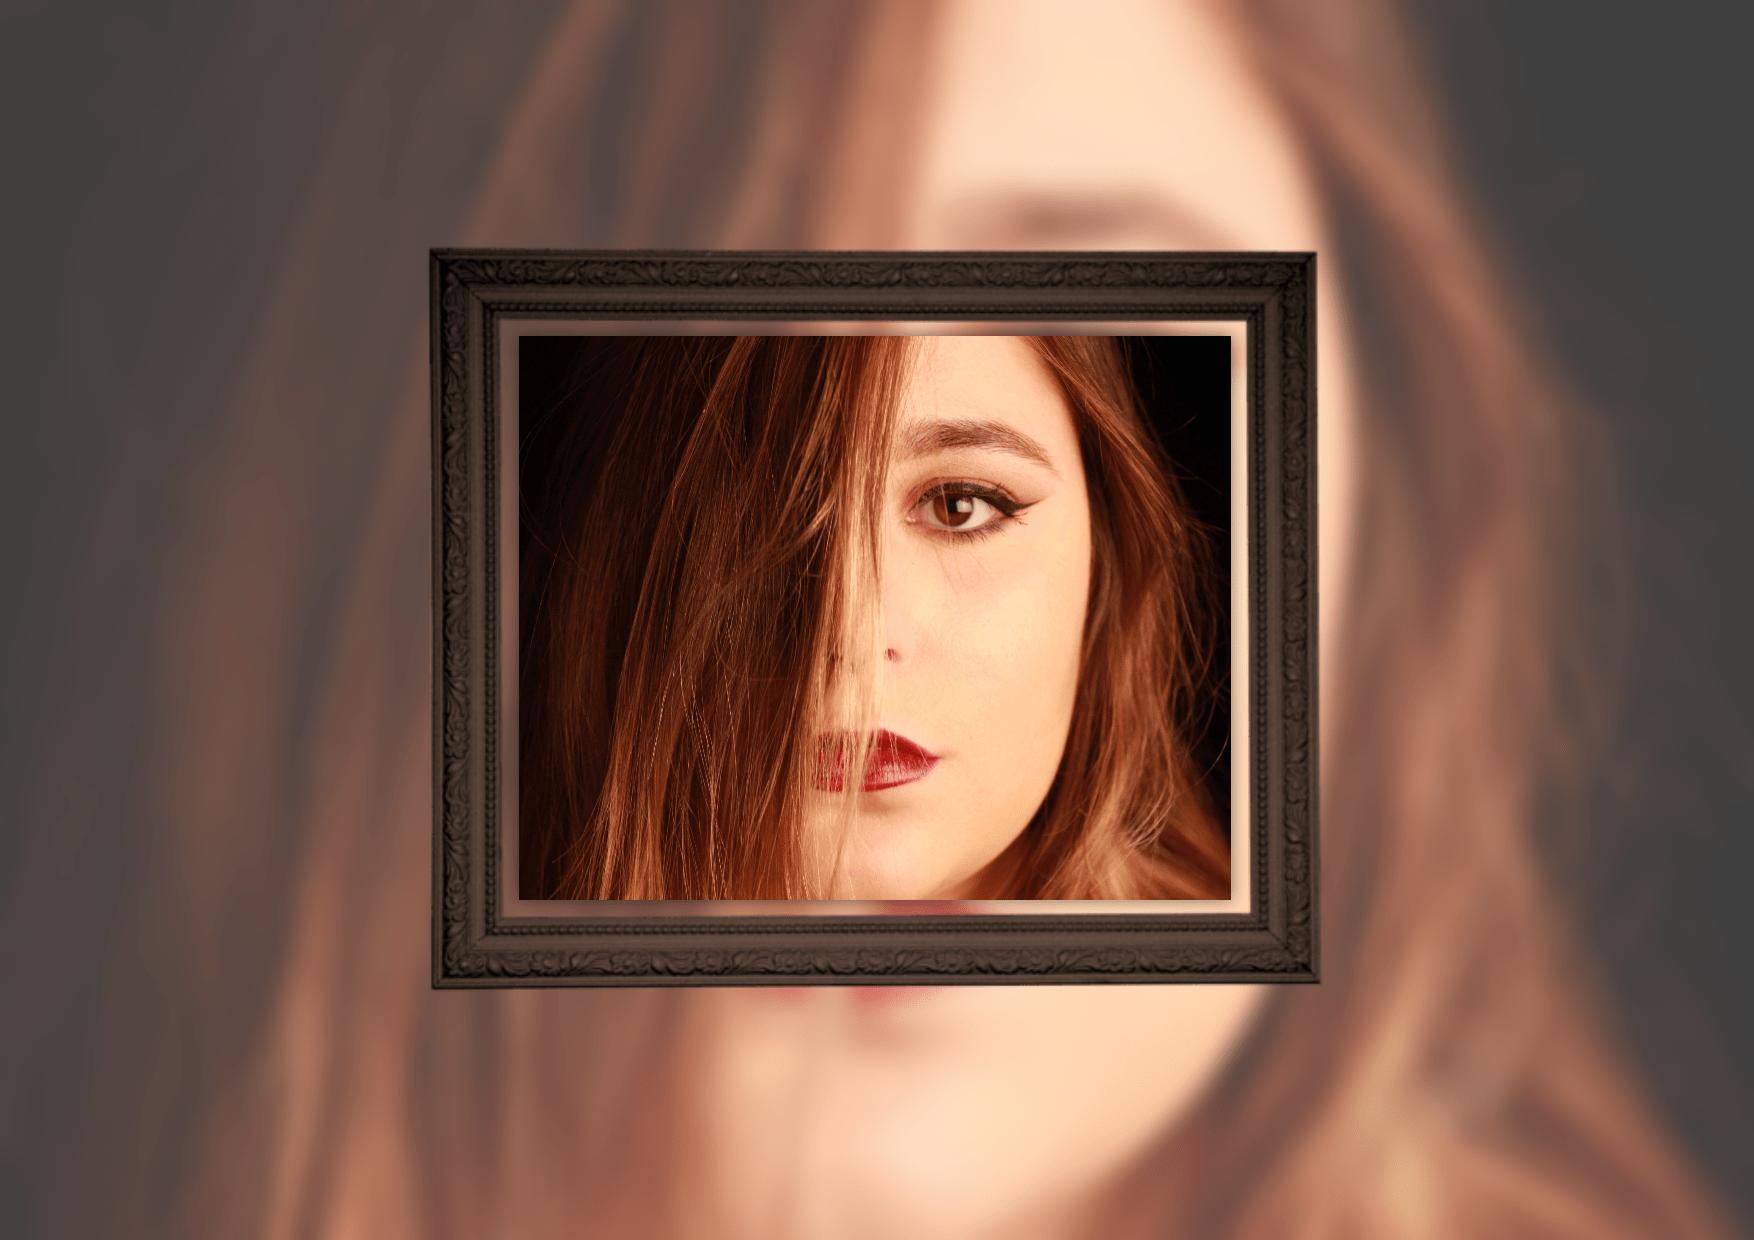 Face,                Hair,                Image,                Nose,                Photography,                Mockup,                Frame,                Avatar,                White,                Black,                Red,                 Free Image